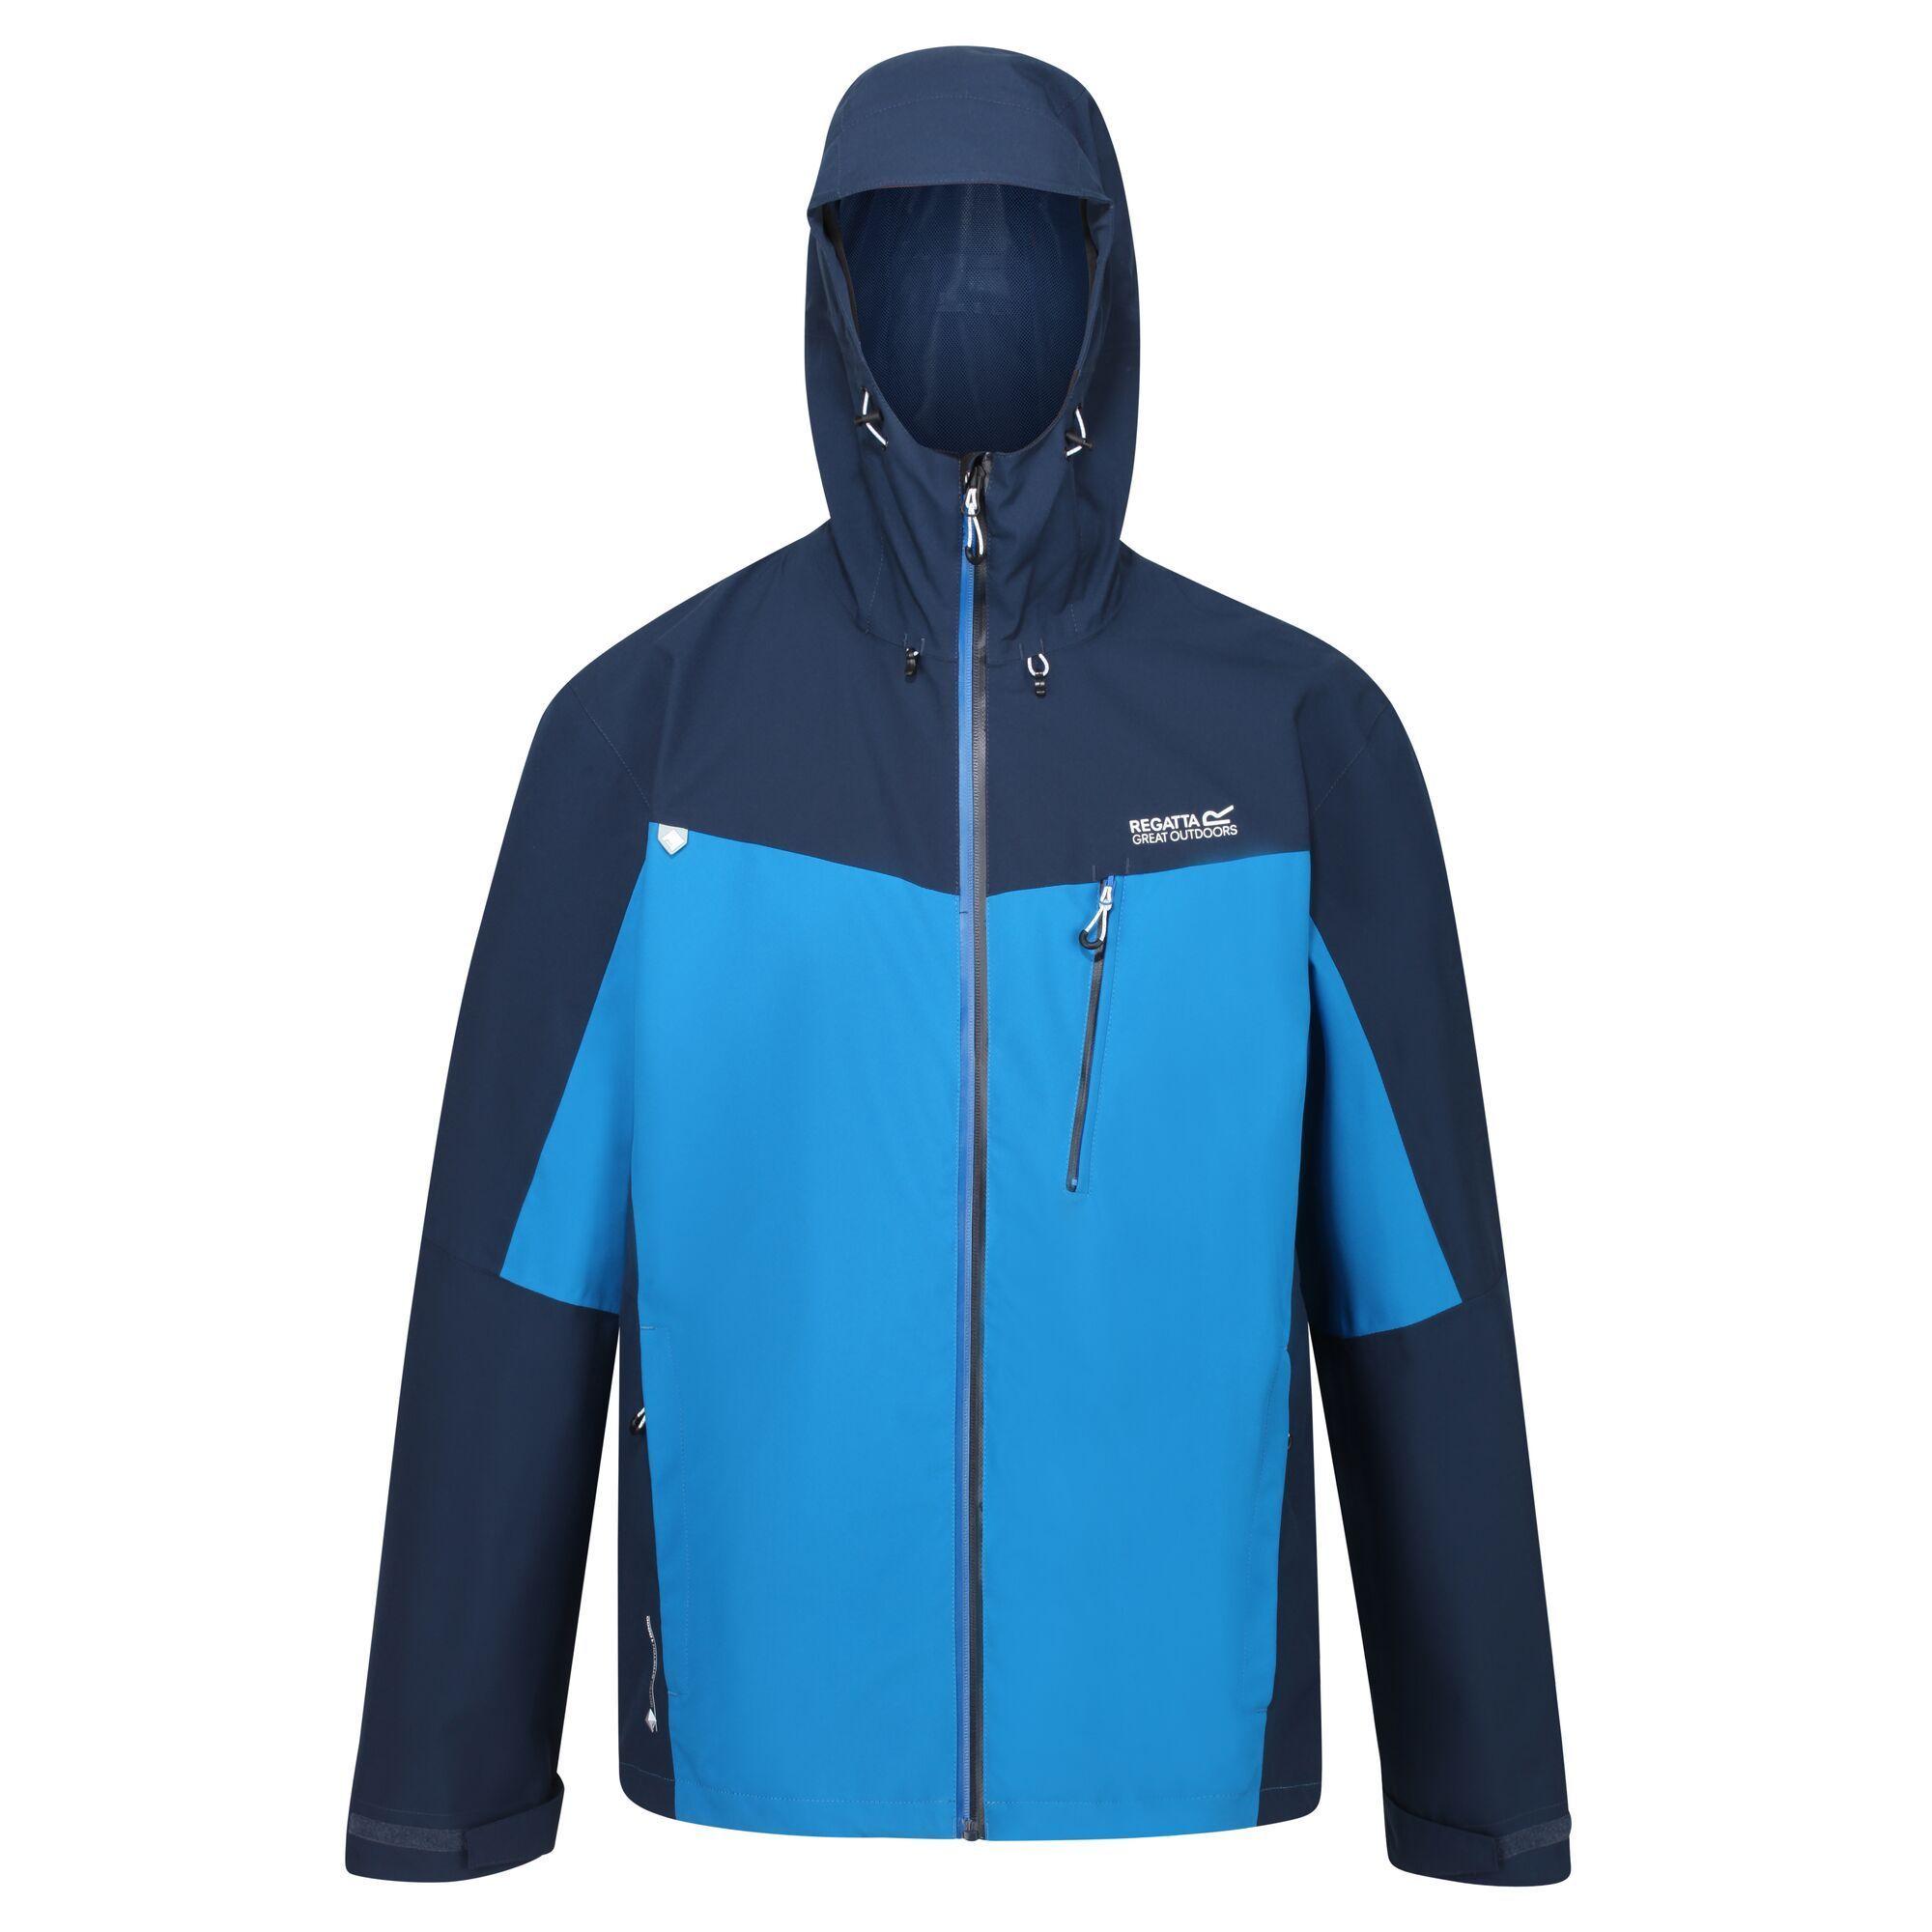 Regatta Mens Birchdale Waterproof Hooded Jacket (Imperial Blue/Nightfall Navy)